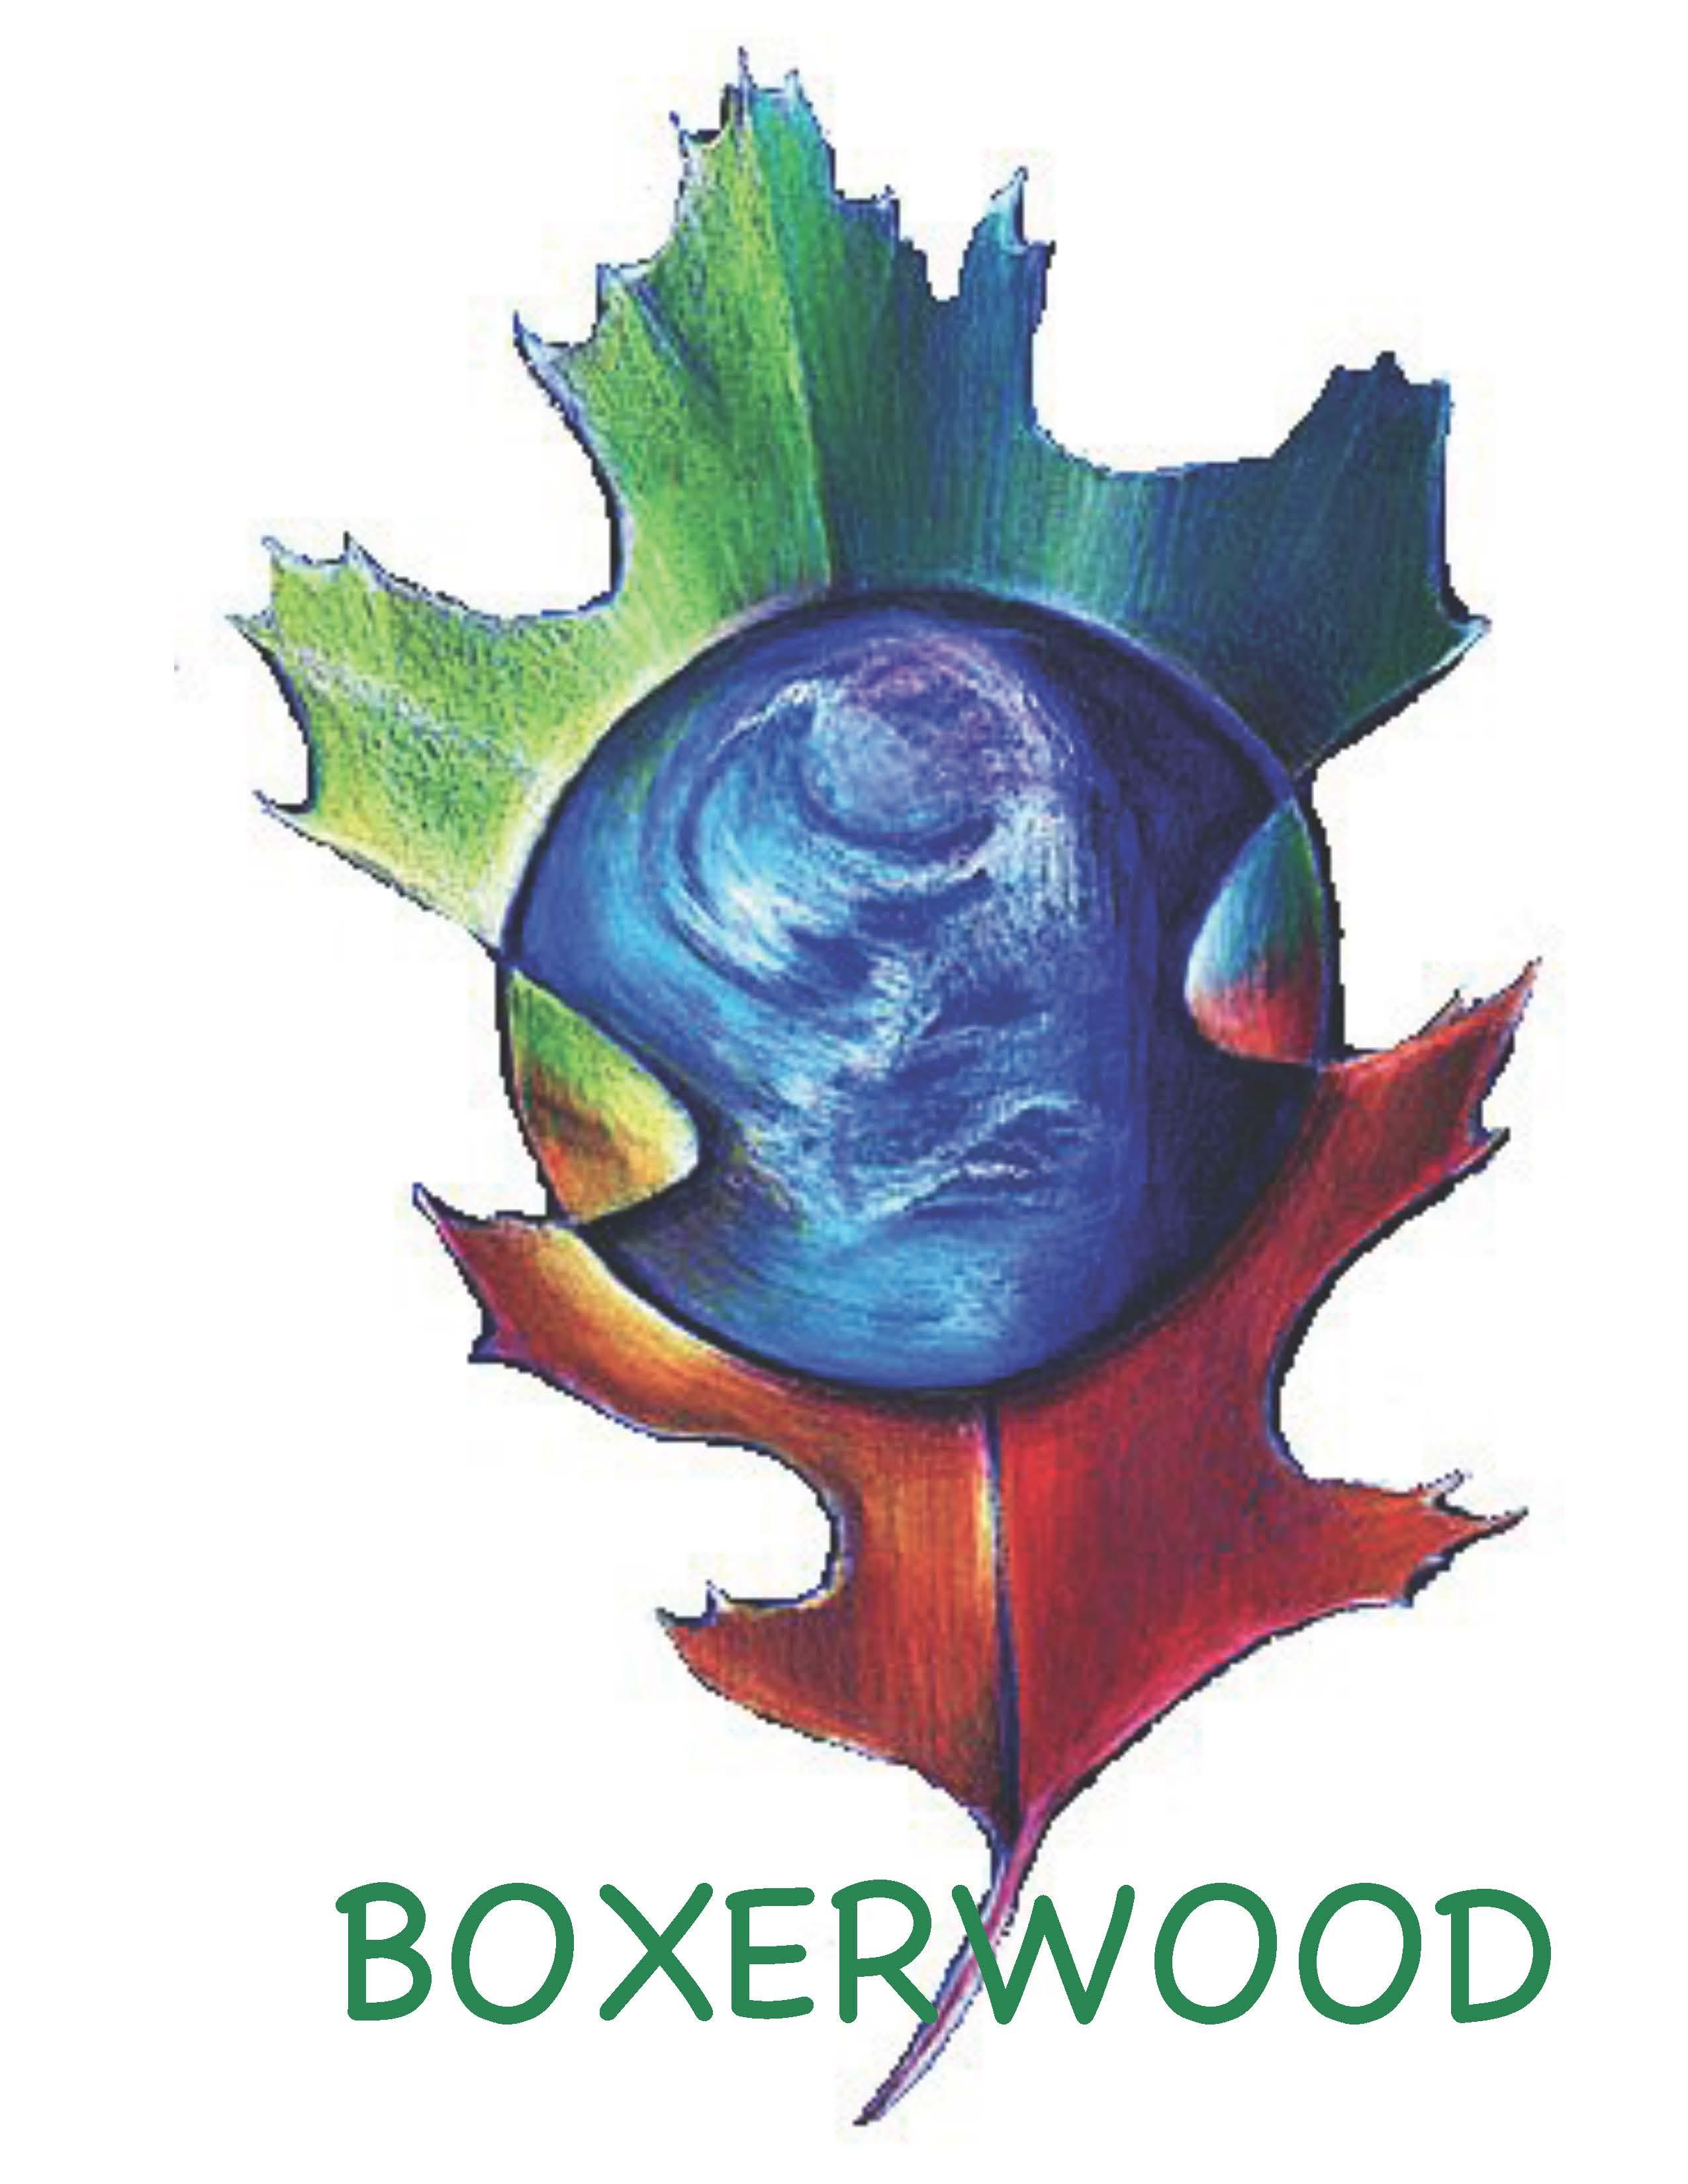 Boxerwood